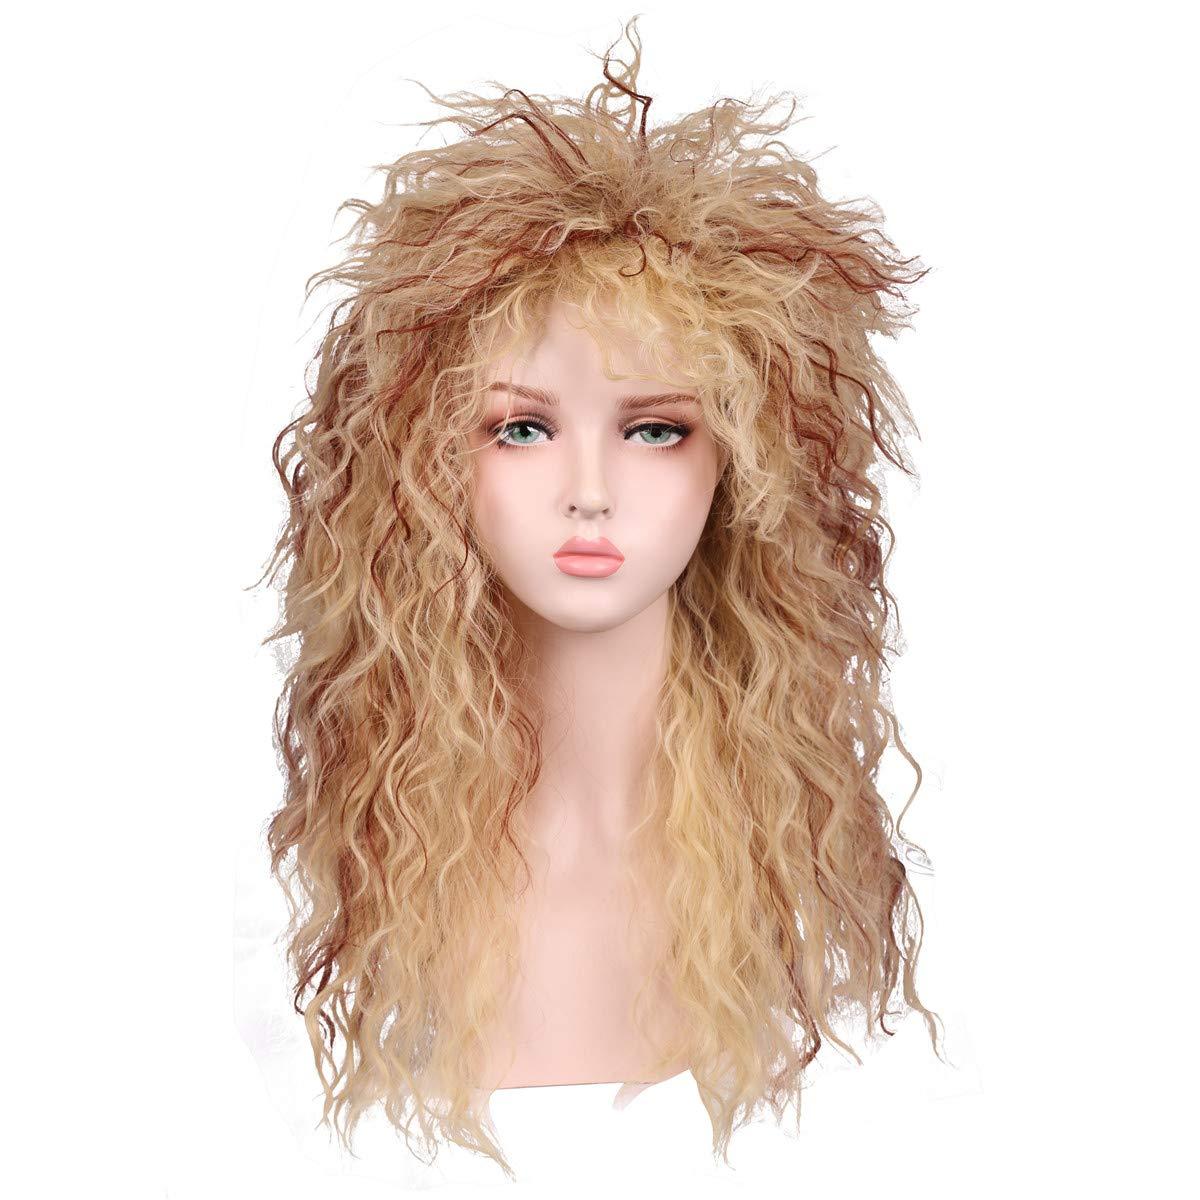 Fantalook Women Long Curly 80s Blonde with Reddish Brown Cosplay Wig by FantaLook